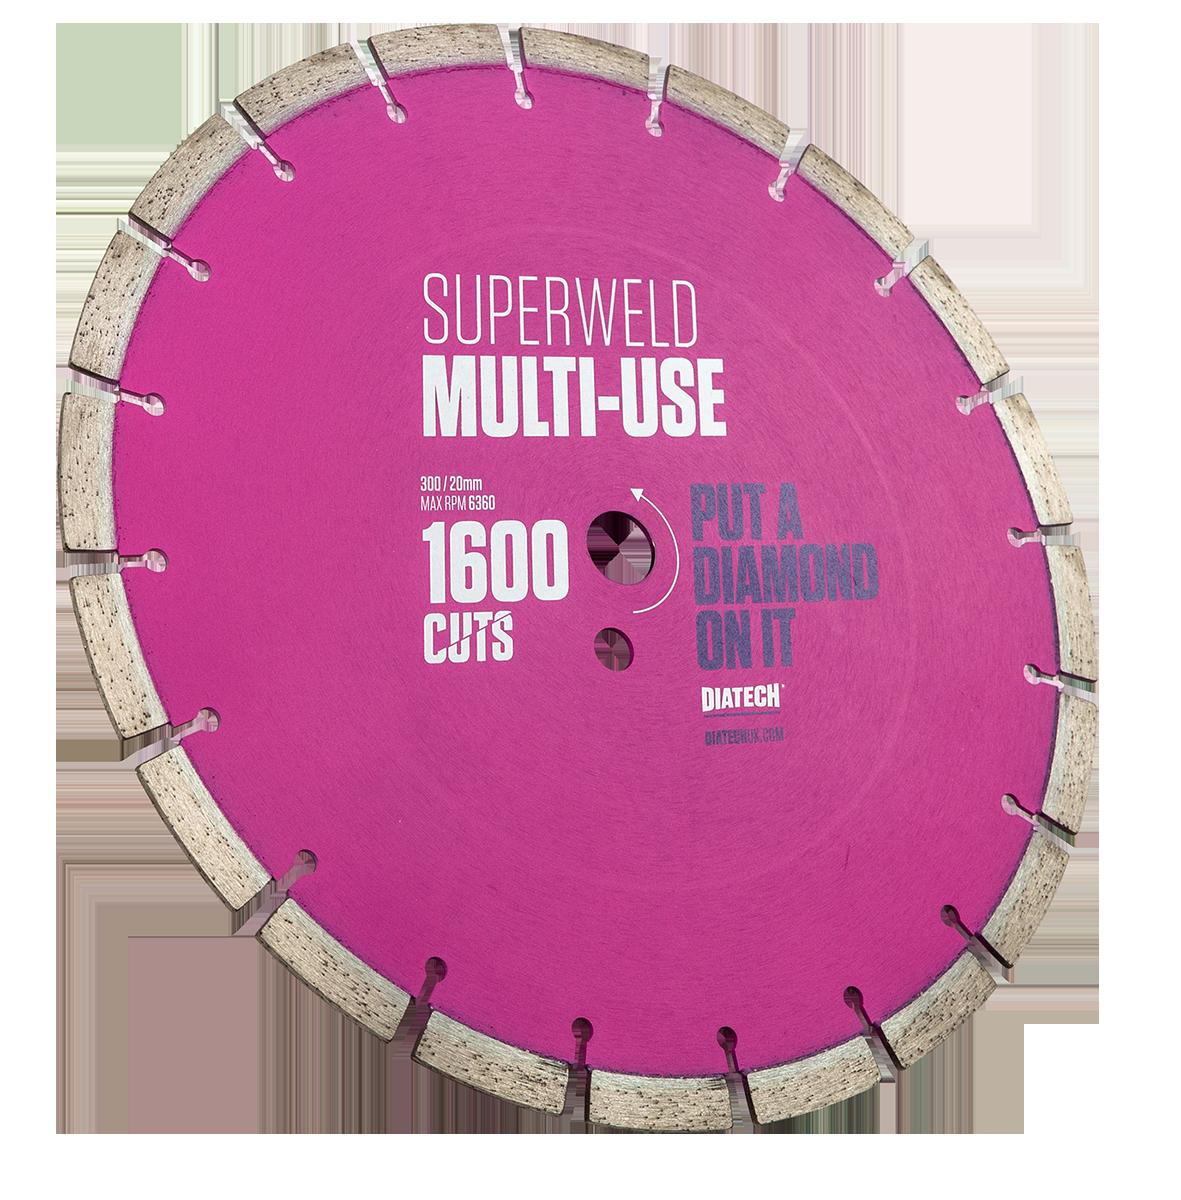 Multi Material Diamond Saw Blades Superweld